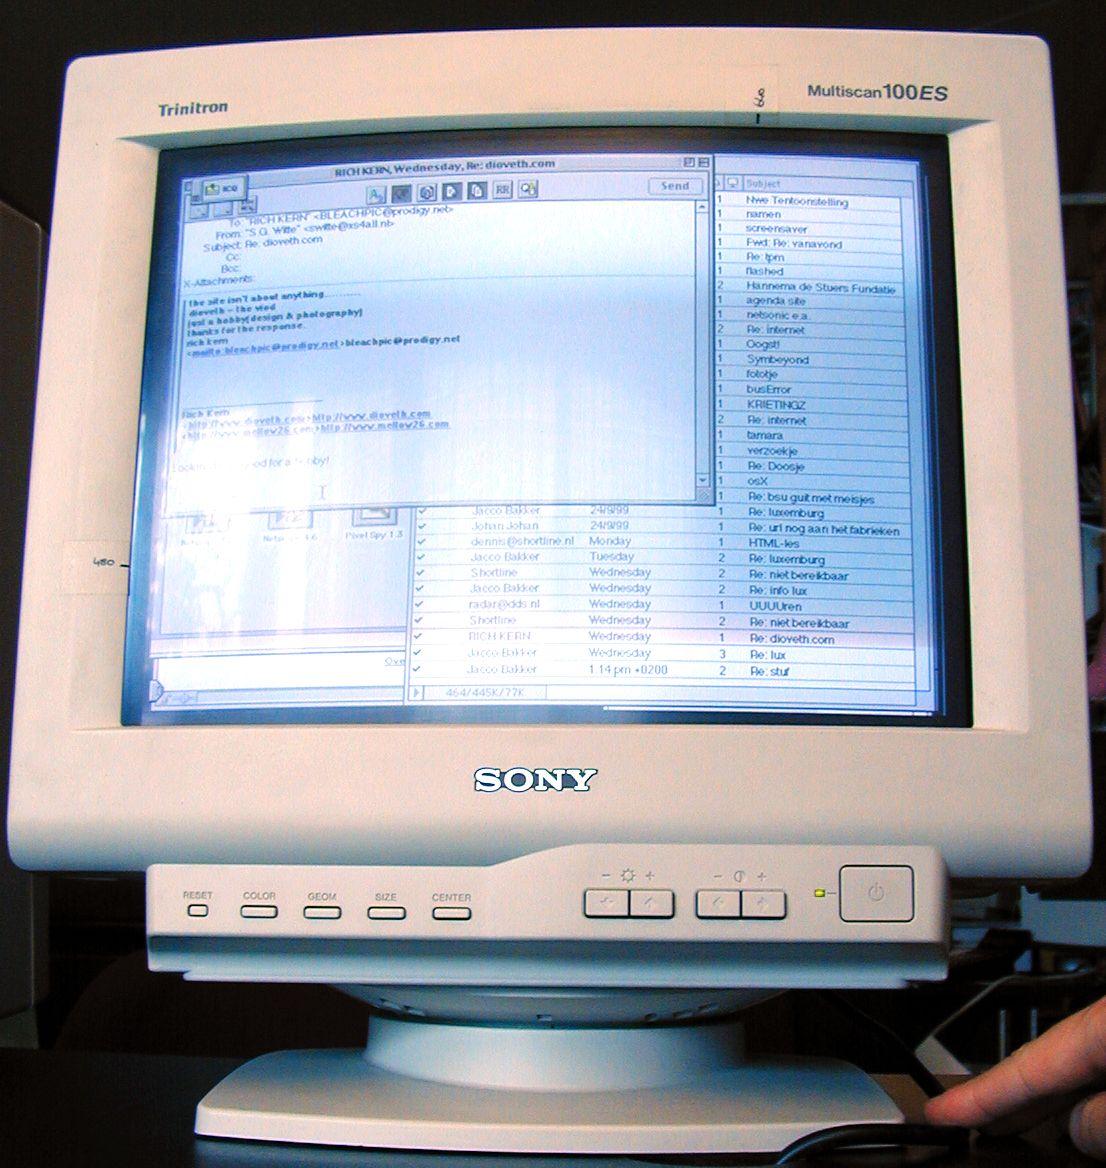 monitor sony trinitron mac apple buttons screen 14 15 inch display